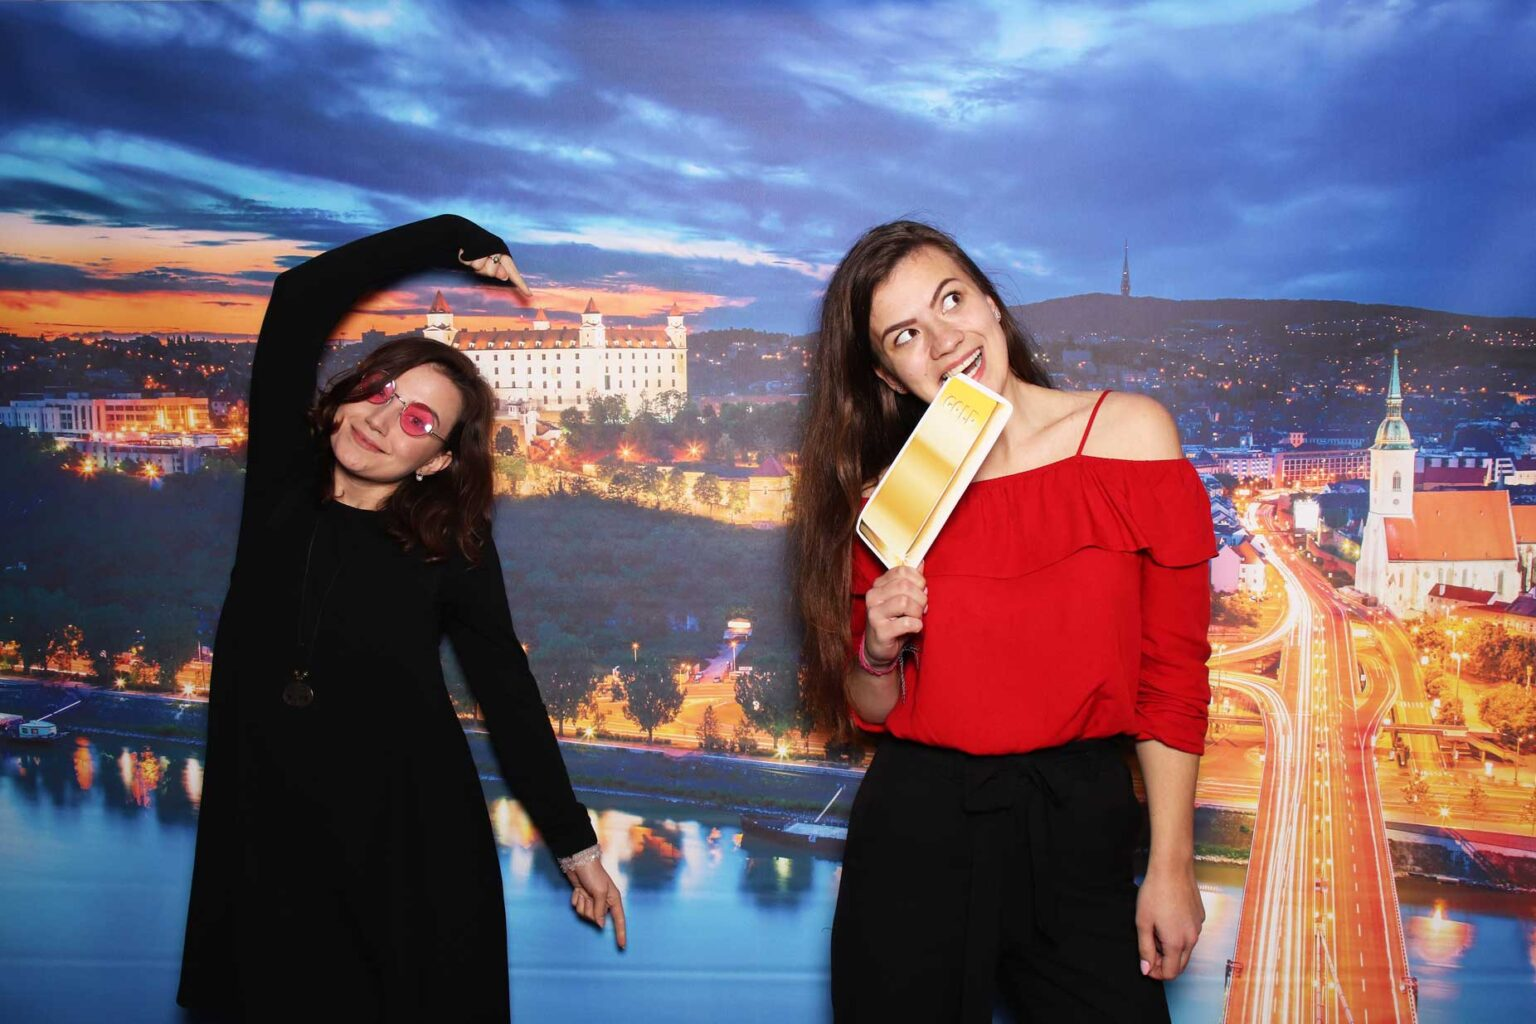 Fotopozadie Bratislava - fotobox na event - fotokútik firemný večierok.